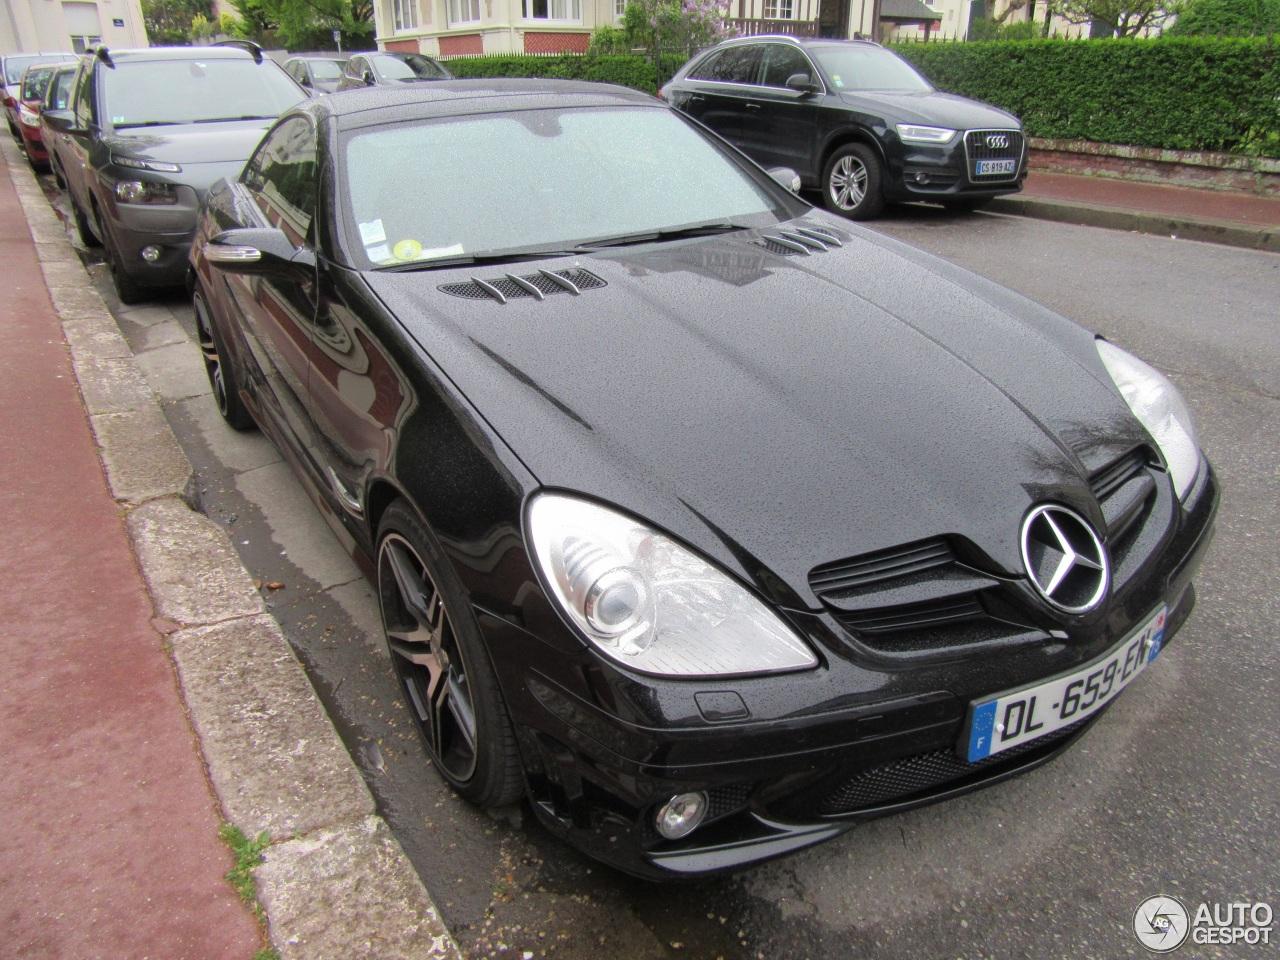 Mercedes benz slk 55 amg r171 6 january 2018 autogespot for Mercedes benz slk 2018